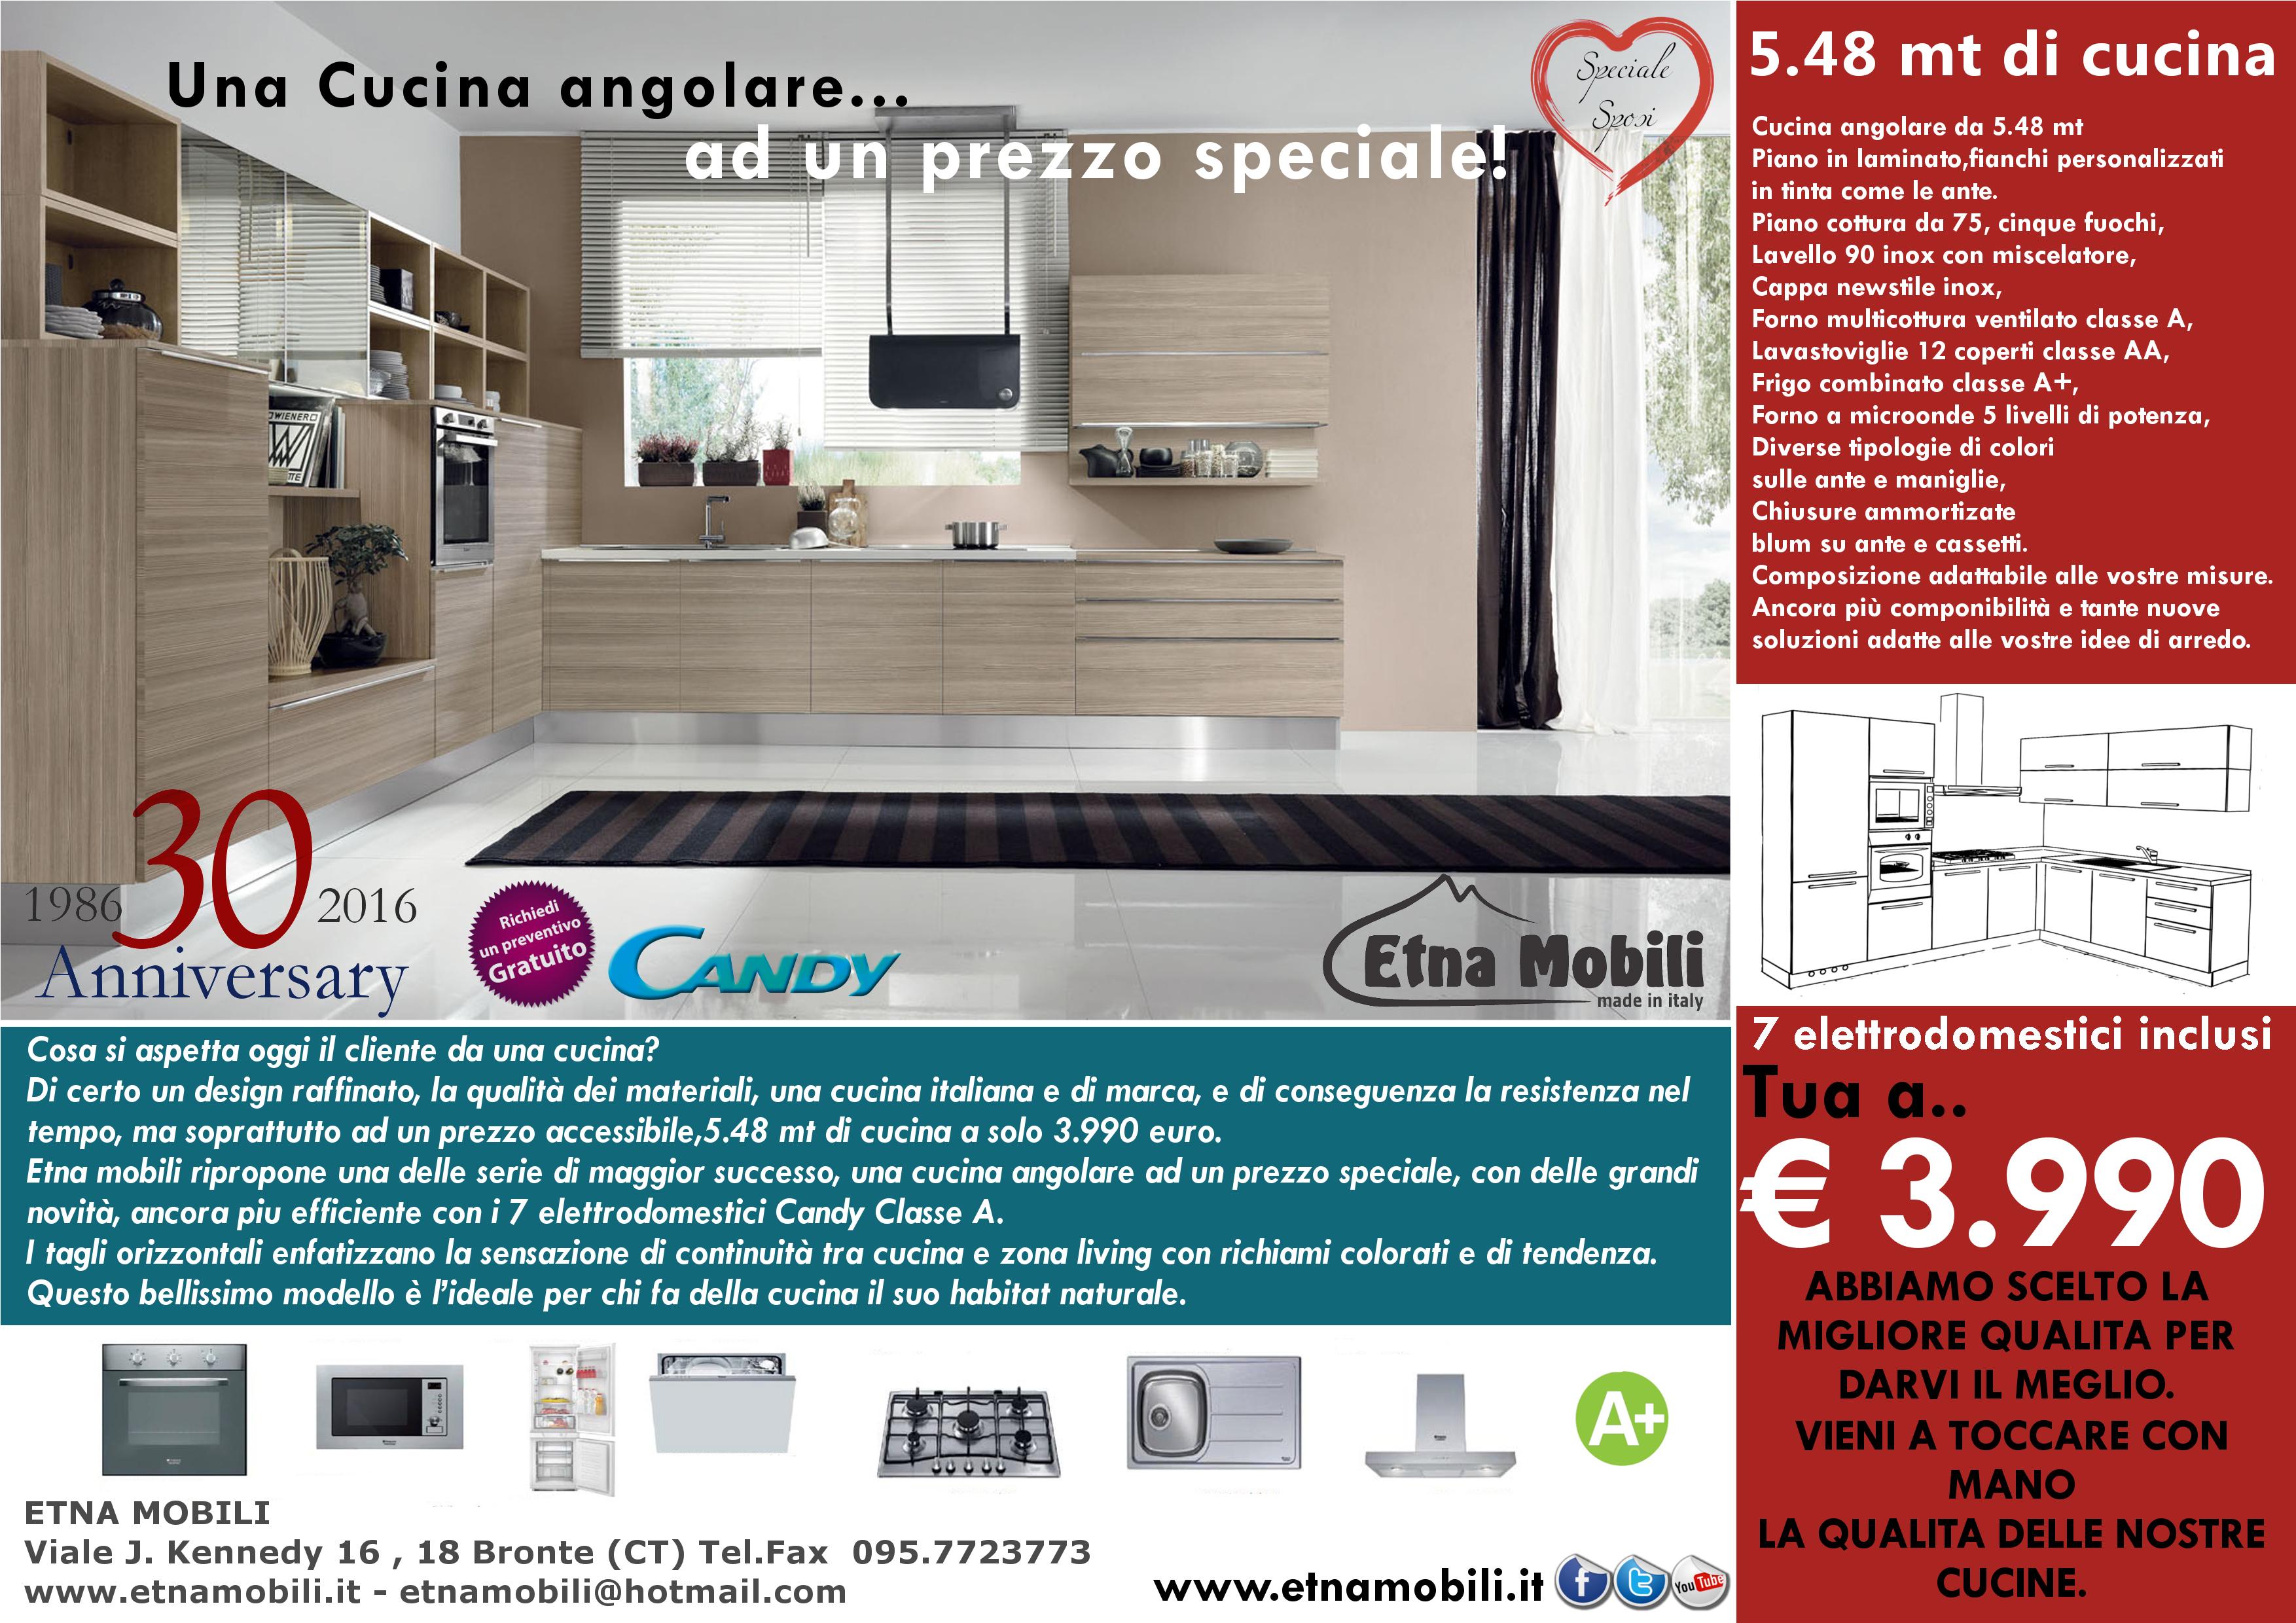 Cucine Componibili Reggio Calabria.Cucine Componibili In Offerta Reggio Calabria Villa S